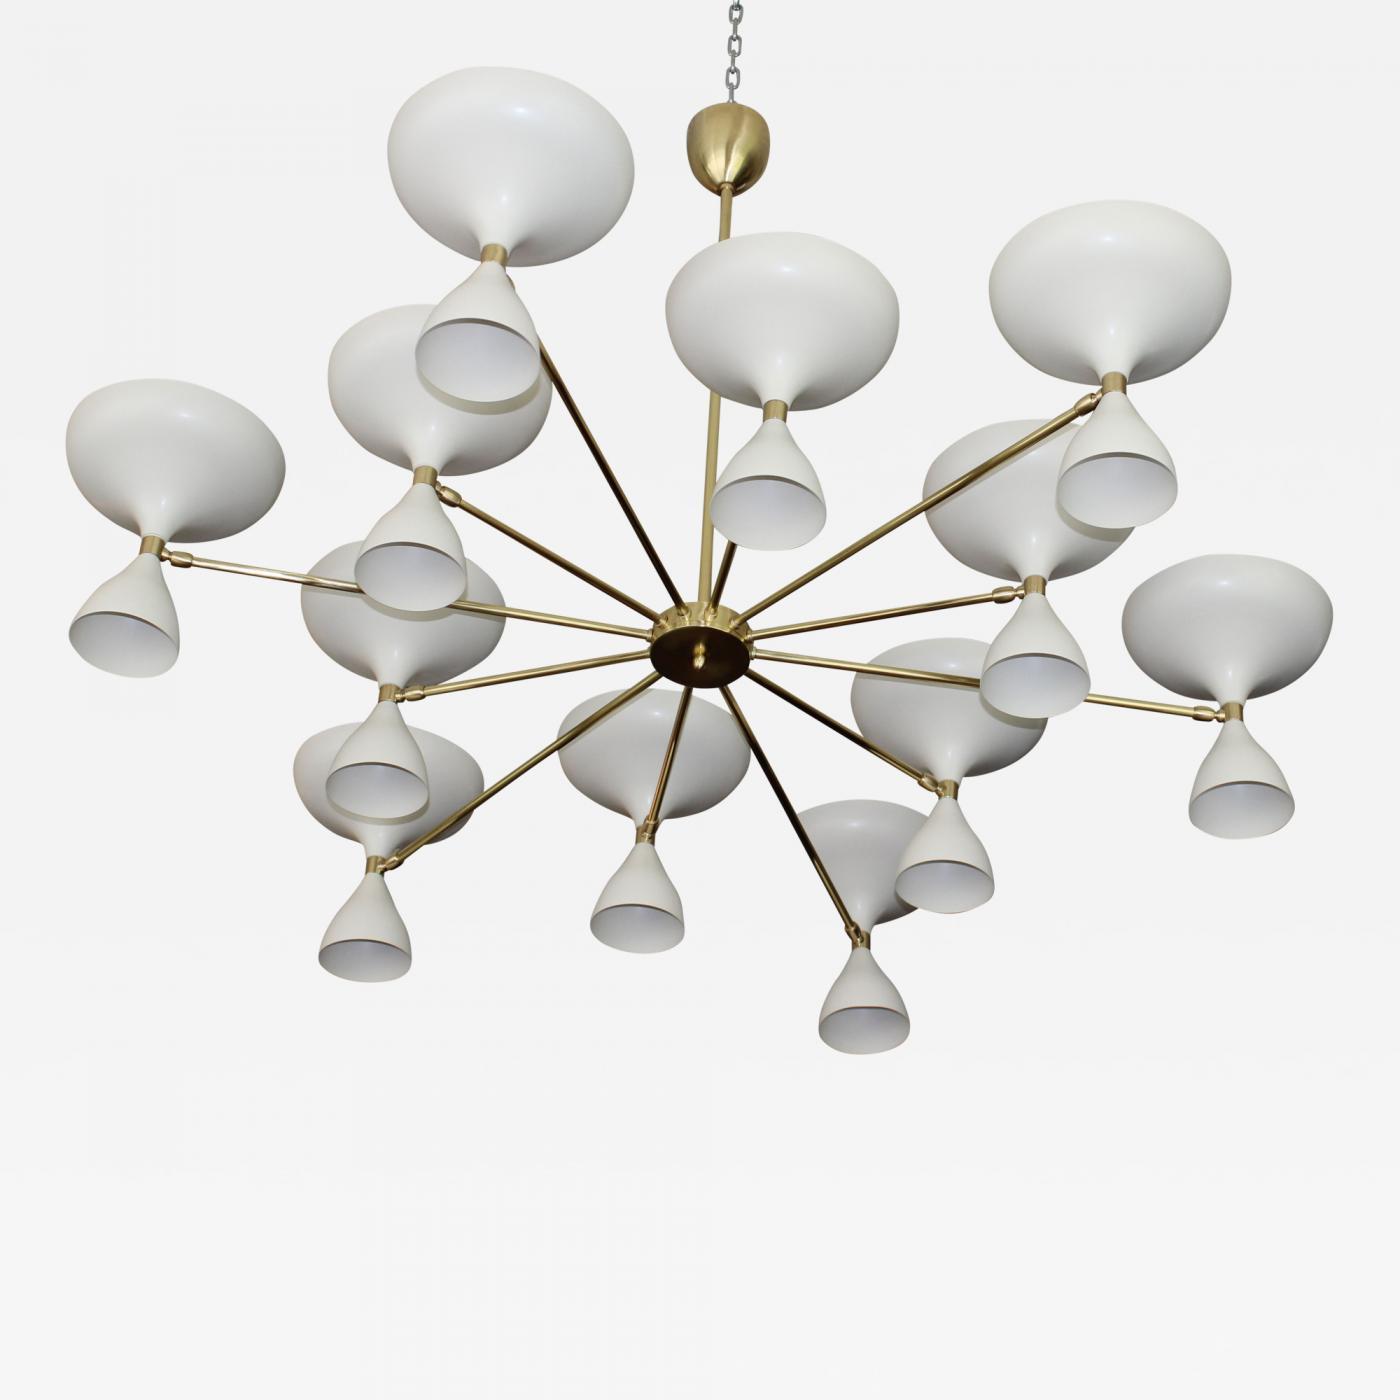 Stellar union stellar union milano chandelier listings furniture lighting chandeliers and pendants aloadofball Images